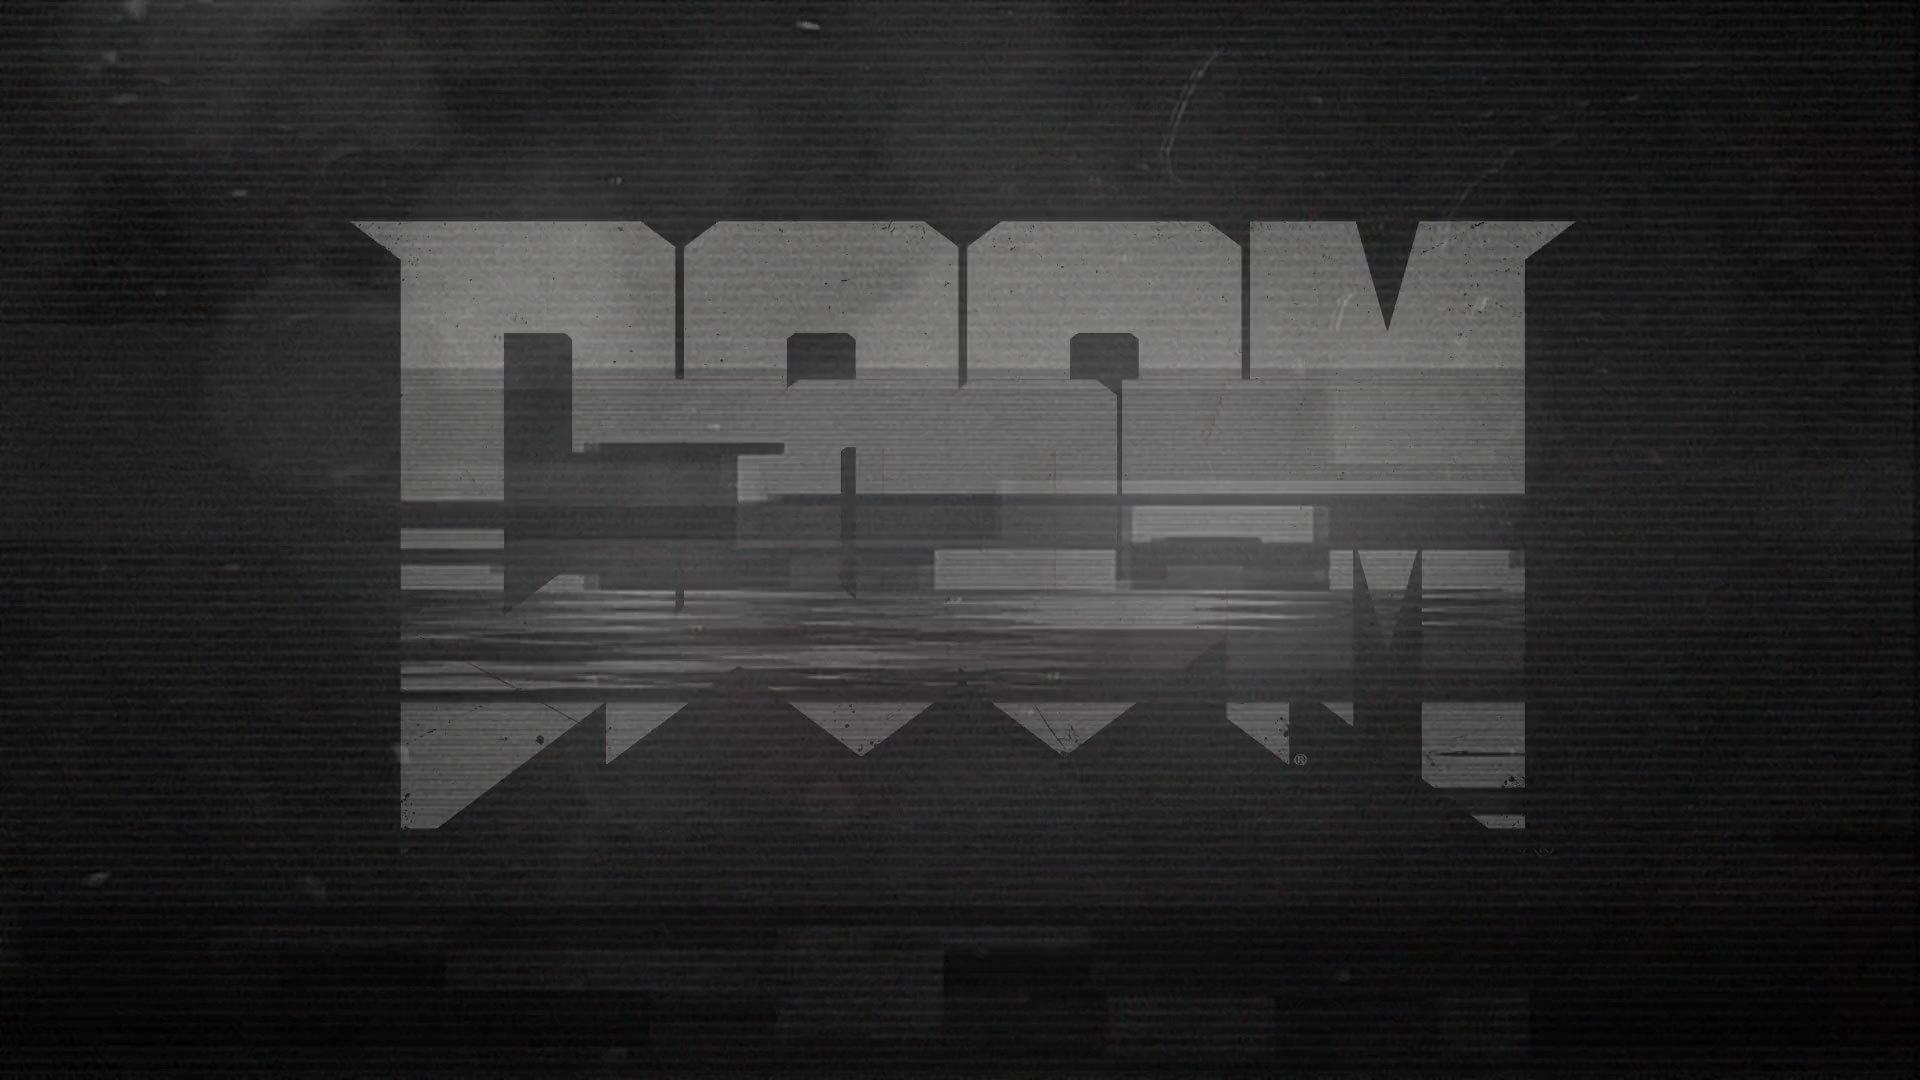 Doom 2016 HD Wallpaper